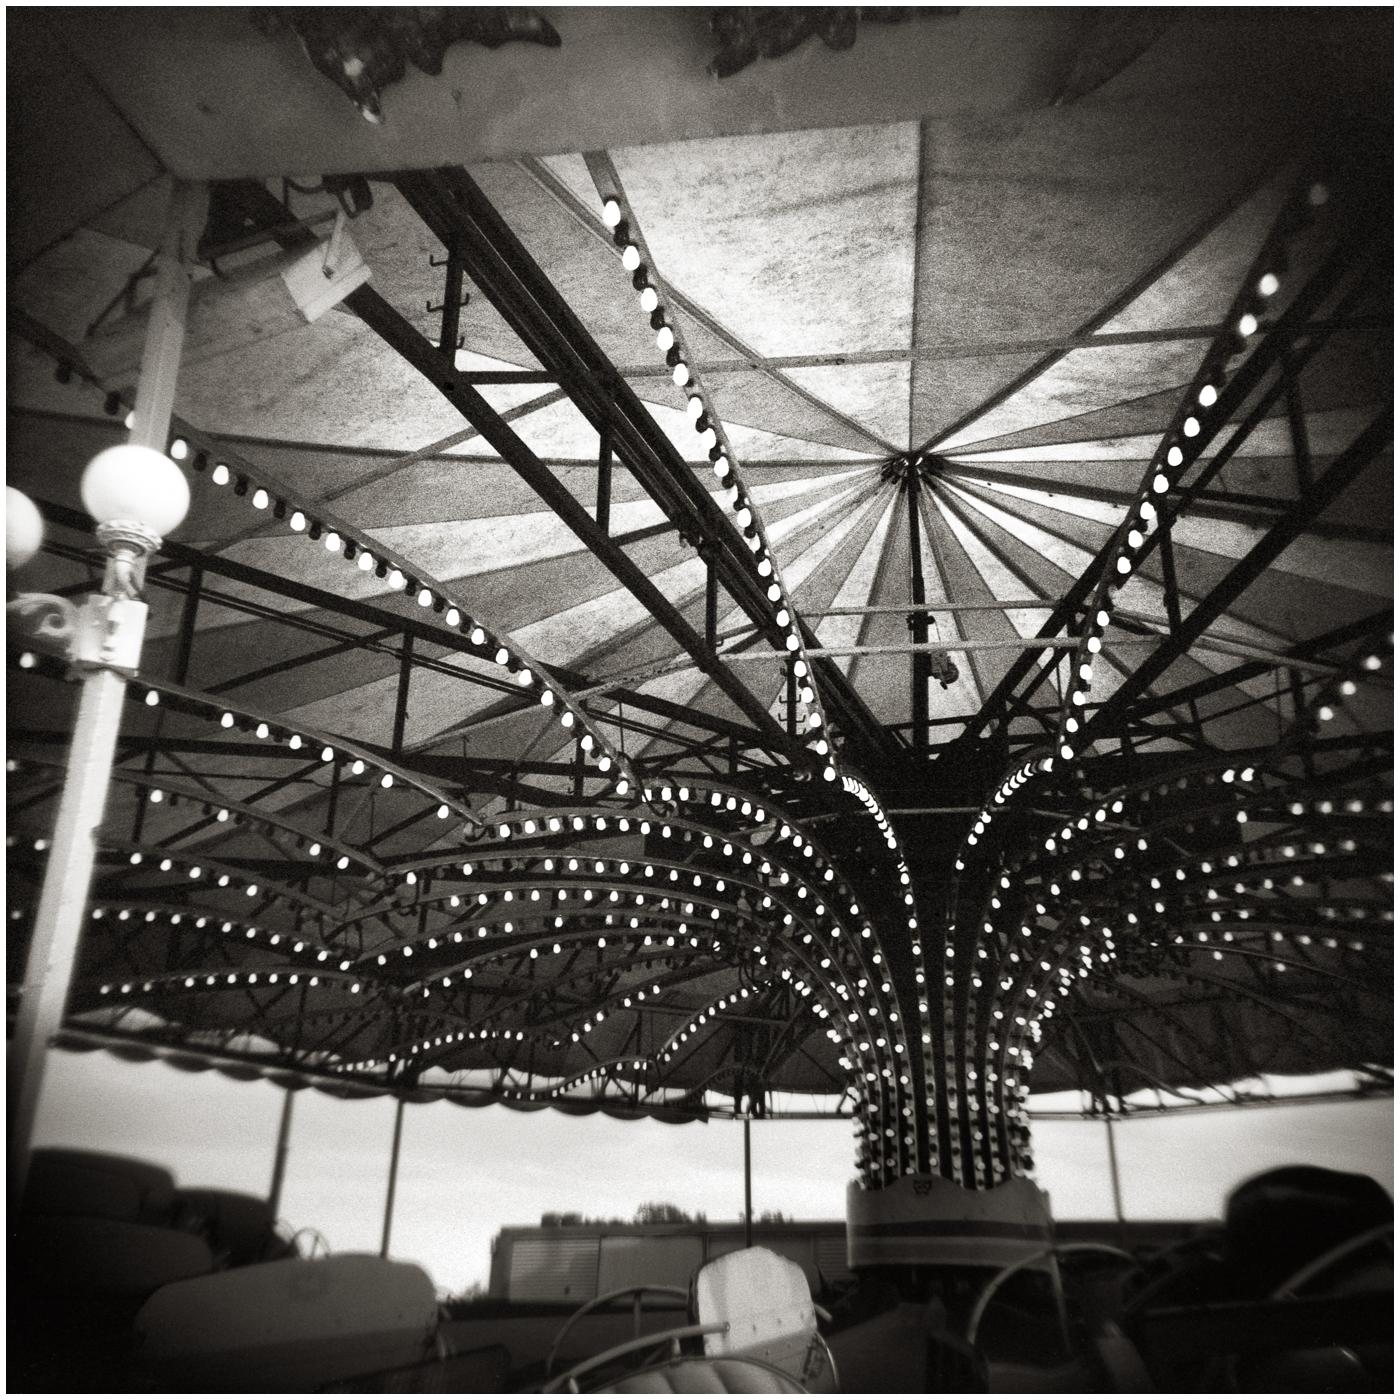 Canopy 16x16 toned.jpg